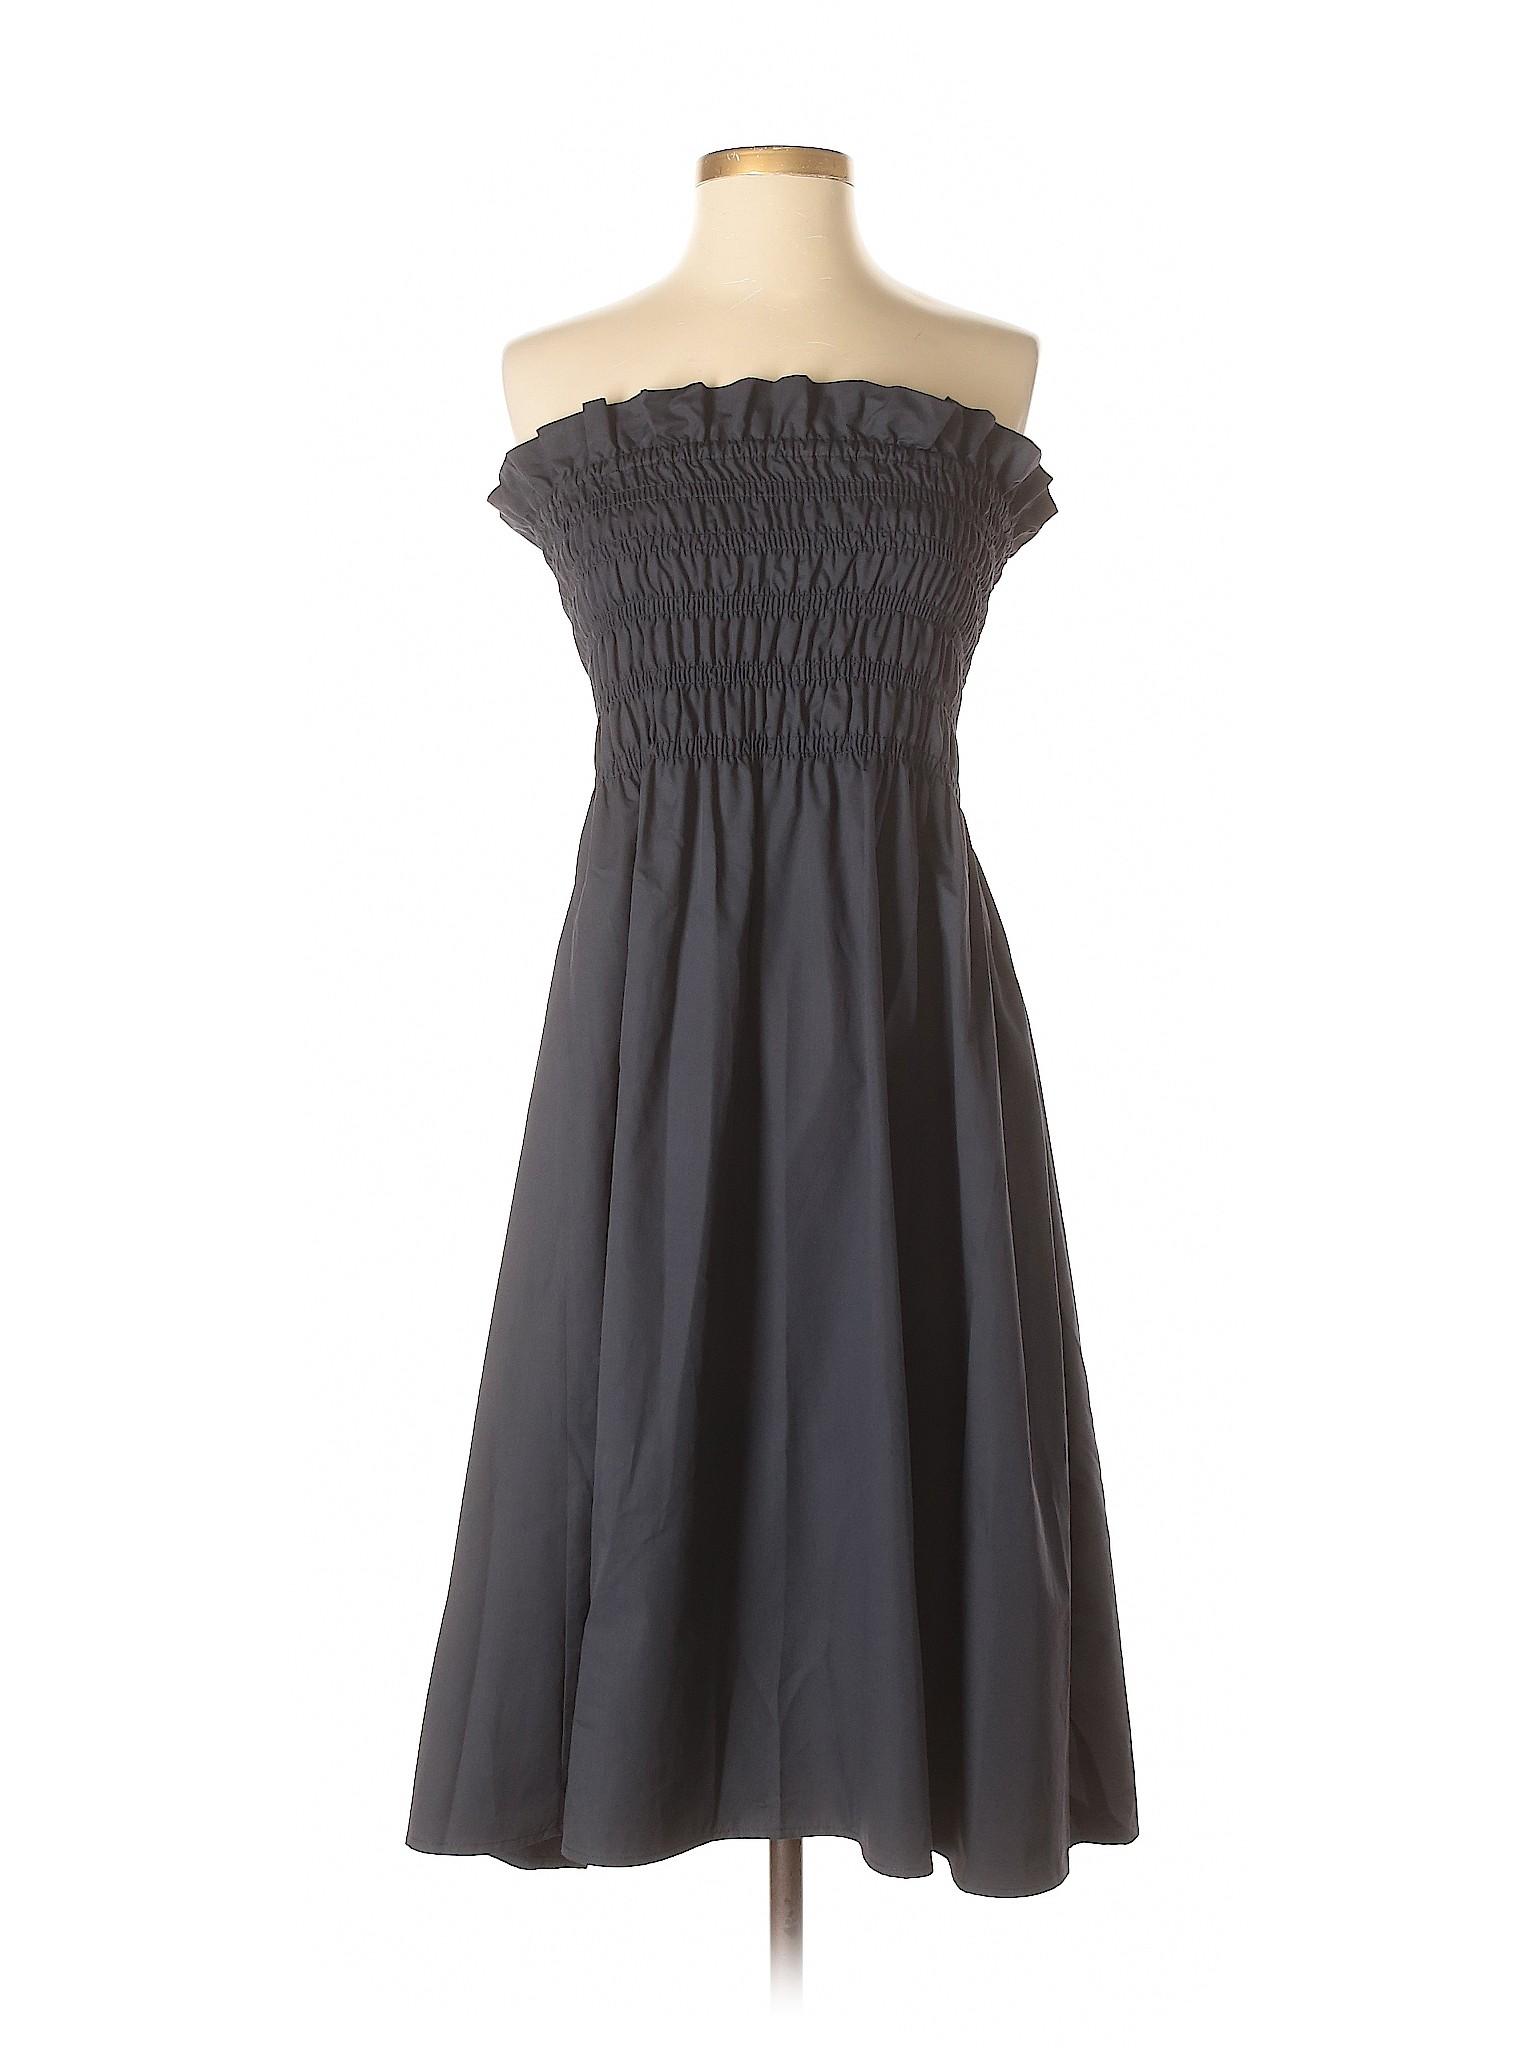 Dress Casual Boutique Zara Boutique Winter Winter Zara 6FBwSqHBY